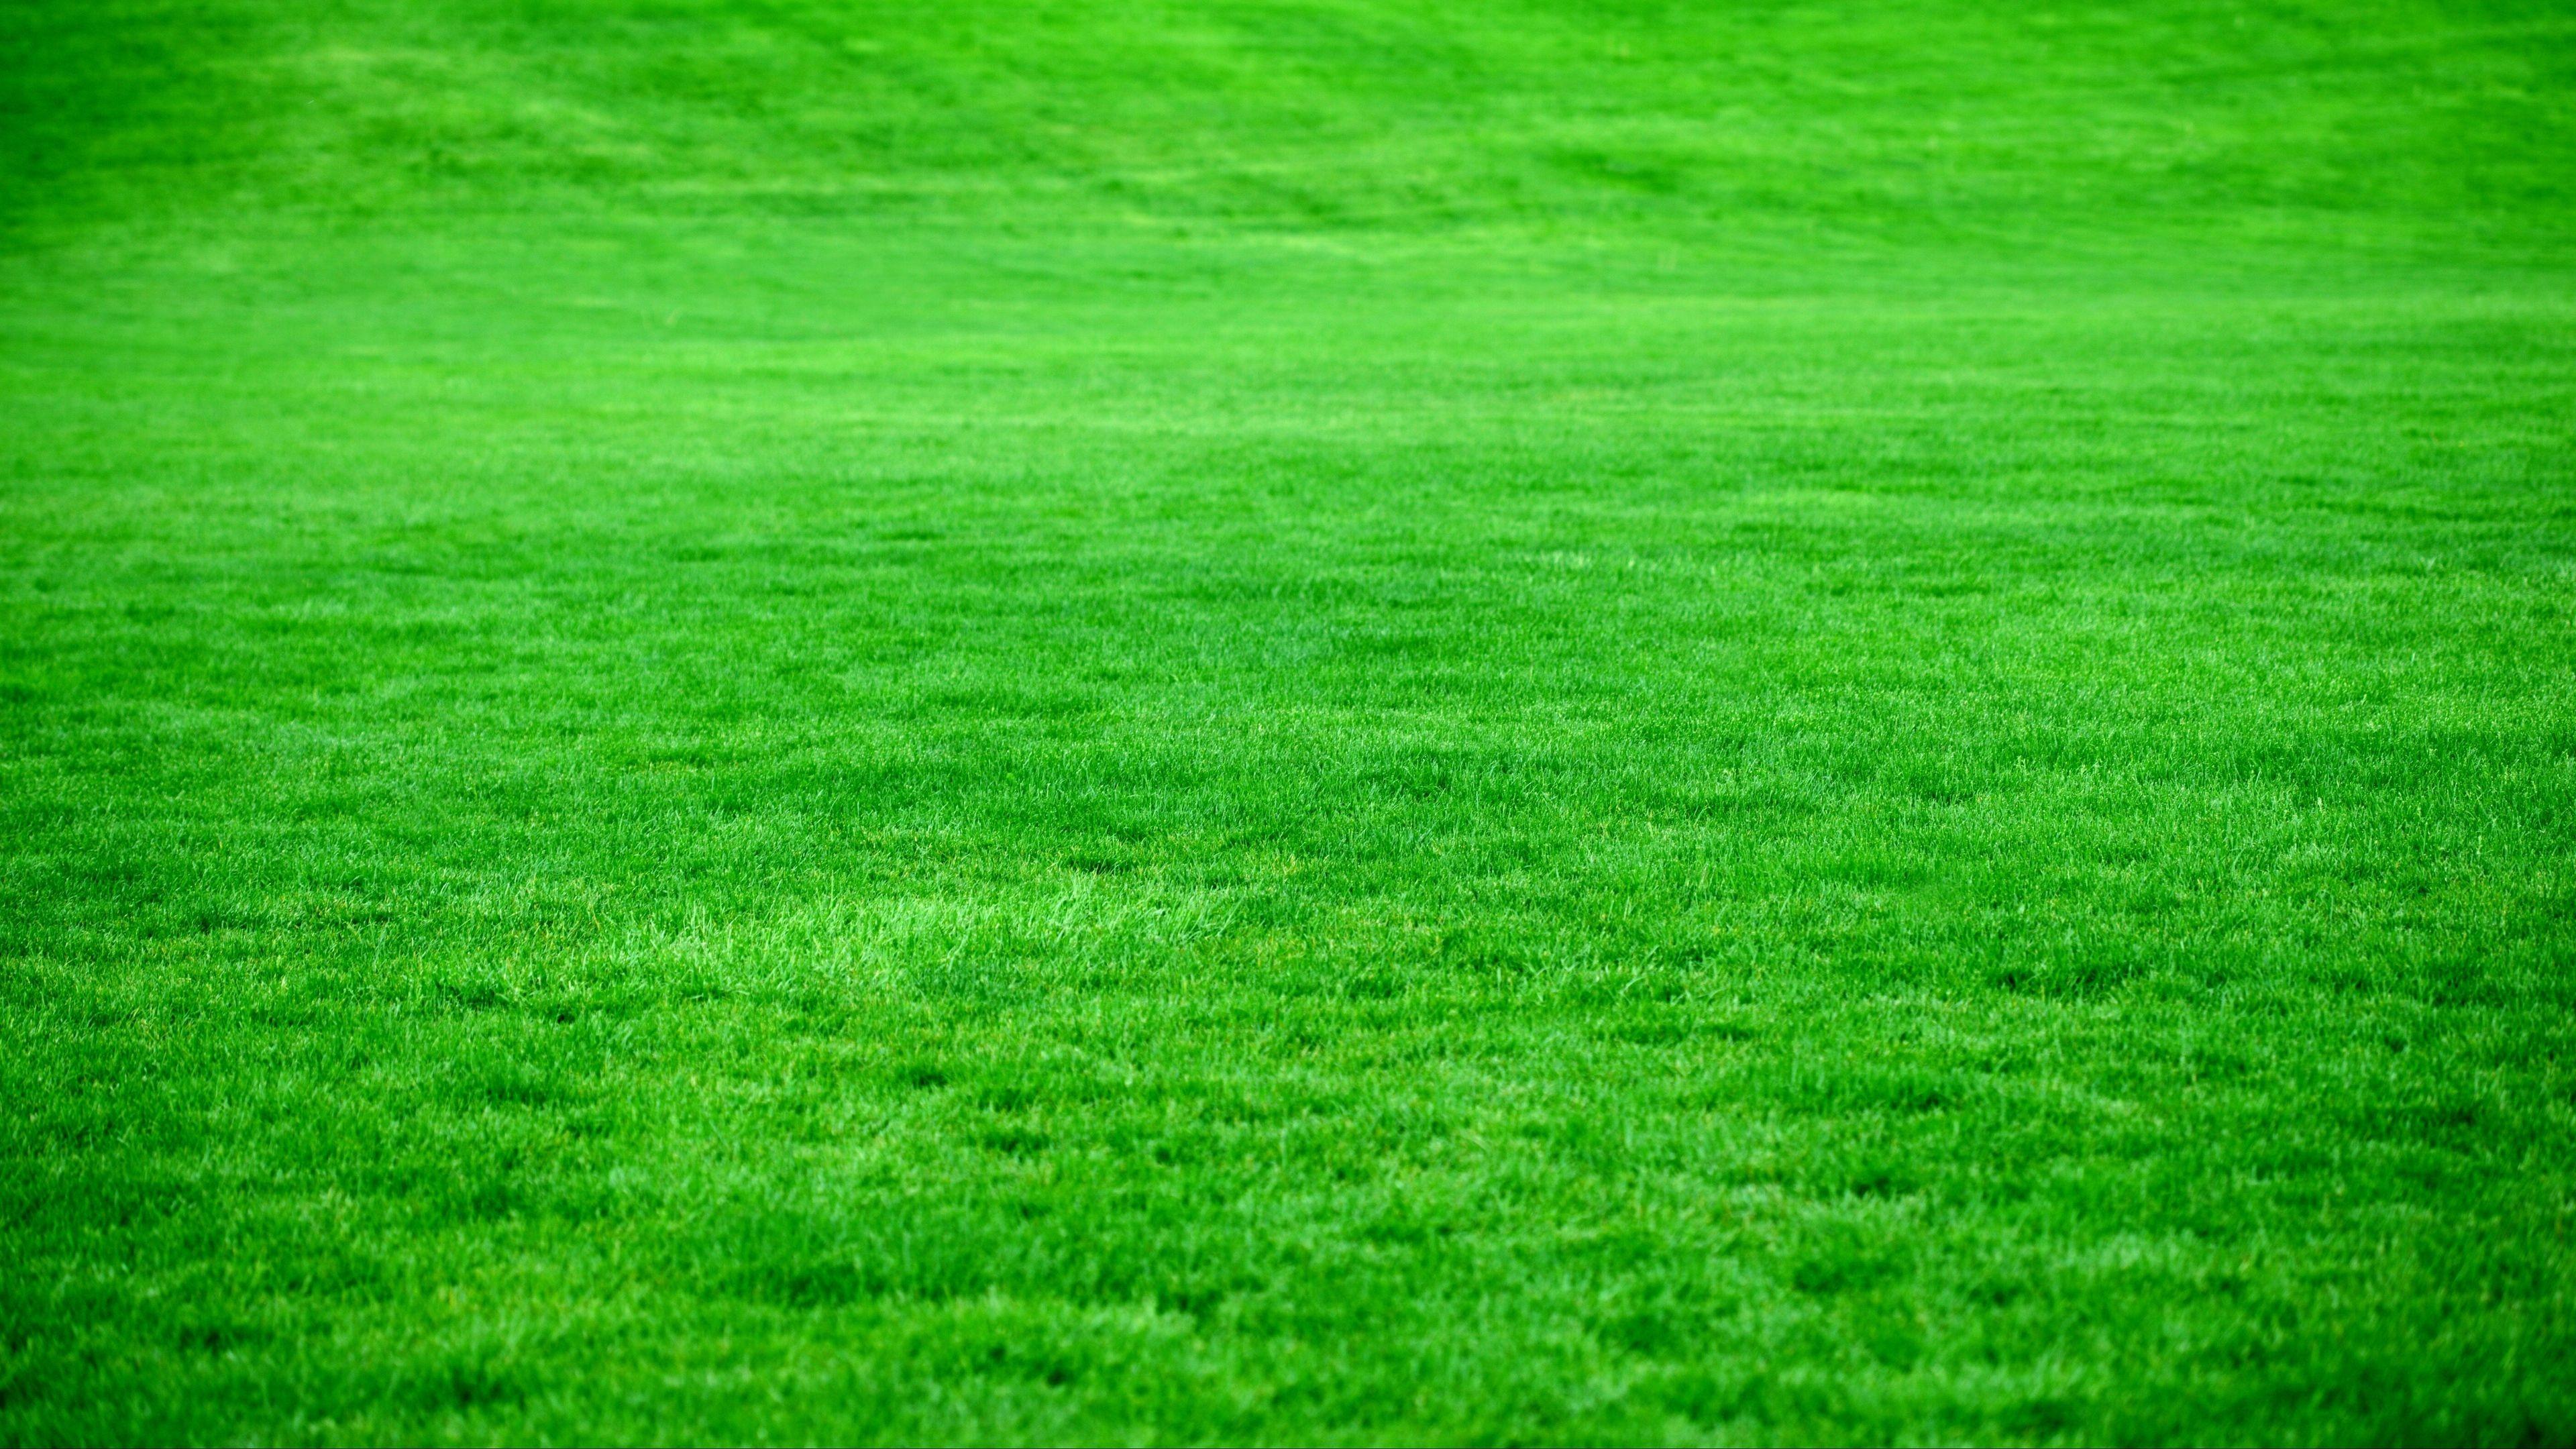 The Lawn HD Wallpaper